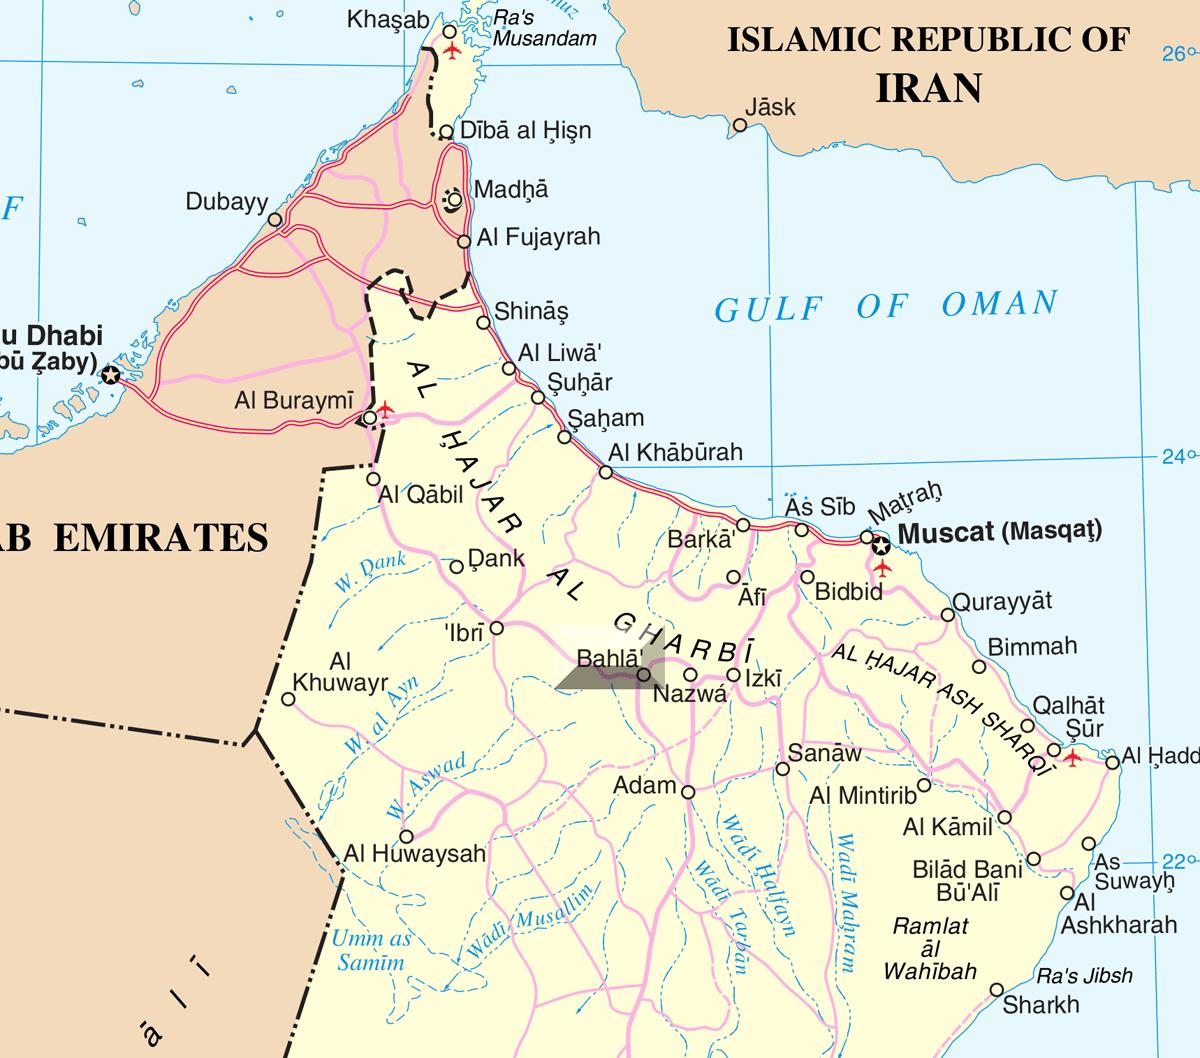 Oman Bahla Oman Muscat Map